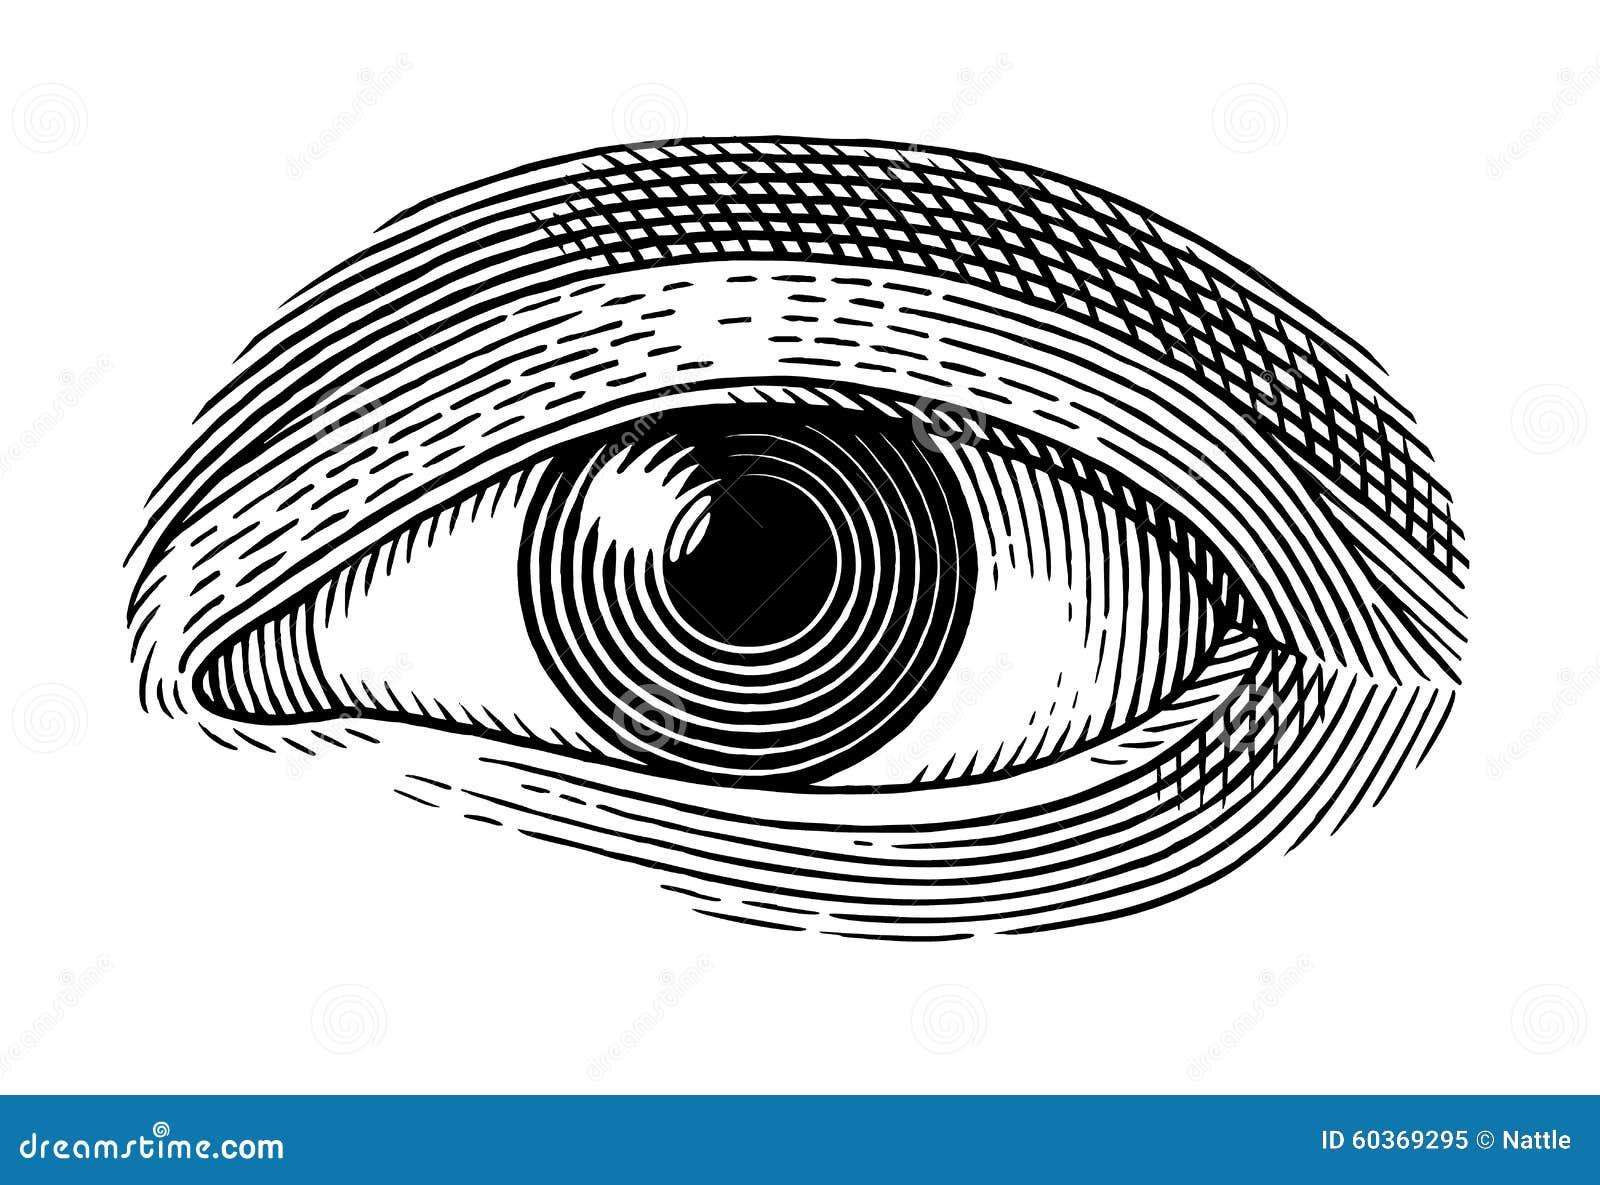 Human eye